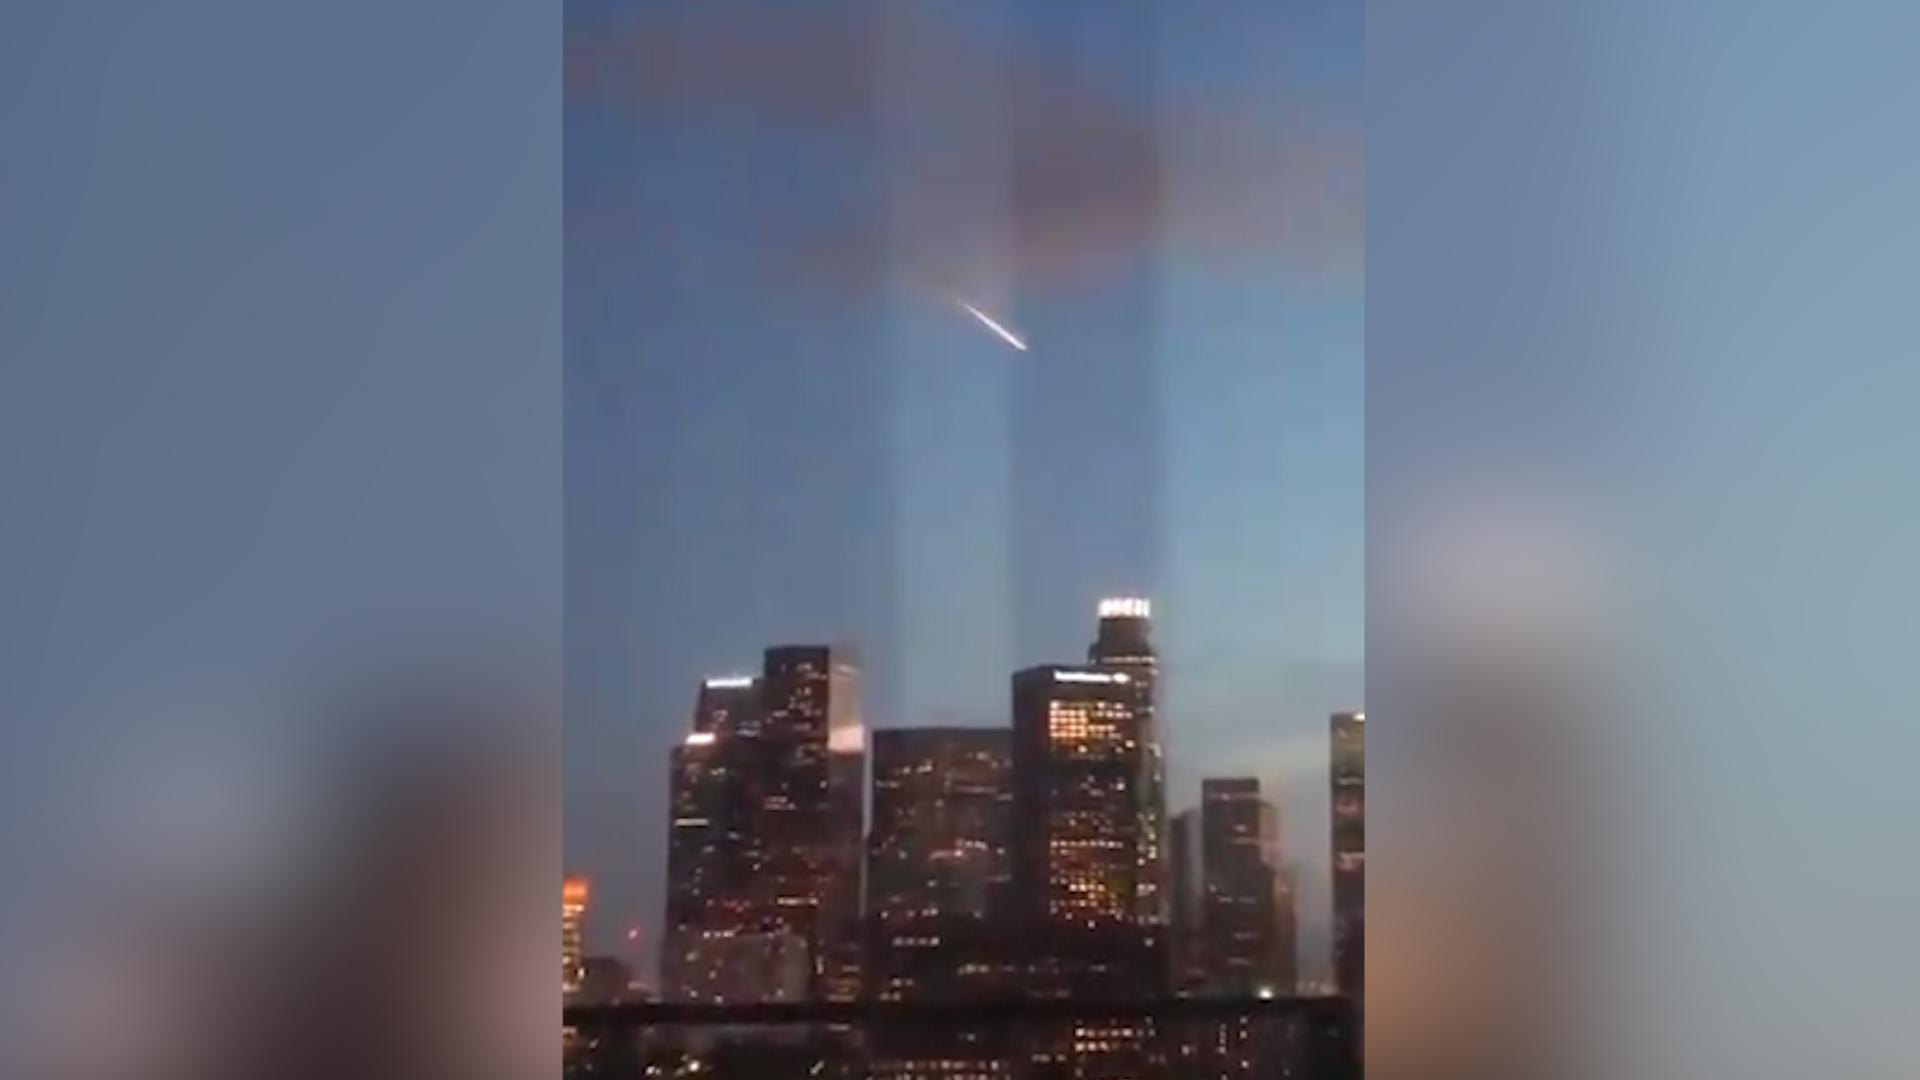 Meteor? Nope. Aliens? Nah. Fiery streak over L.A. was a supermoon marketing stunt.